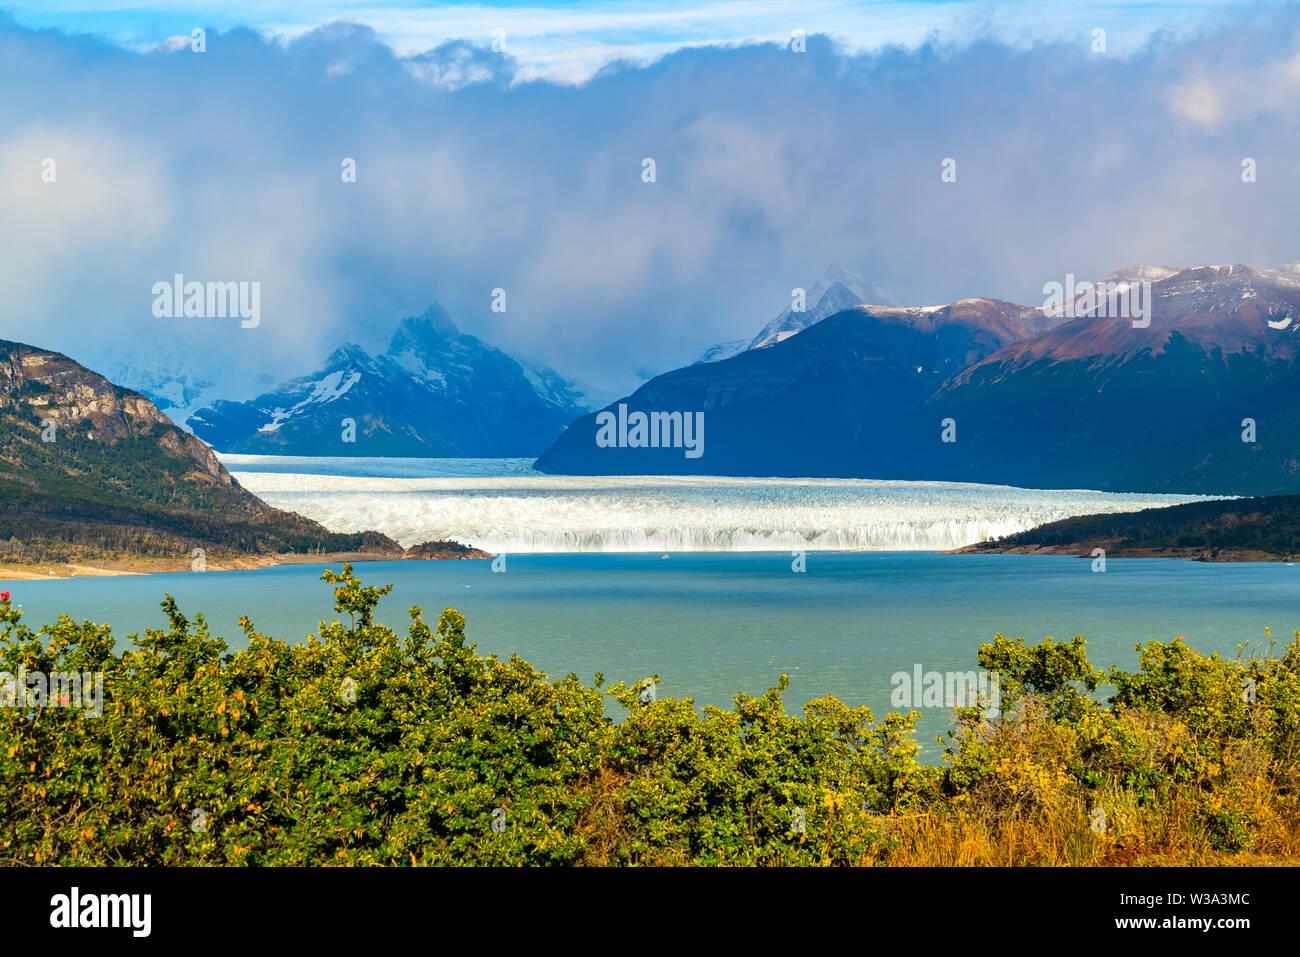 Beautiful landscape of Perito Moreno Glacier at Los Glaciares National park in Patagonia Argentina - Stock Image